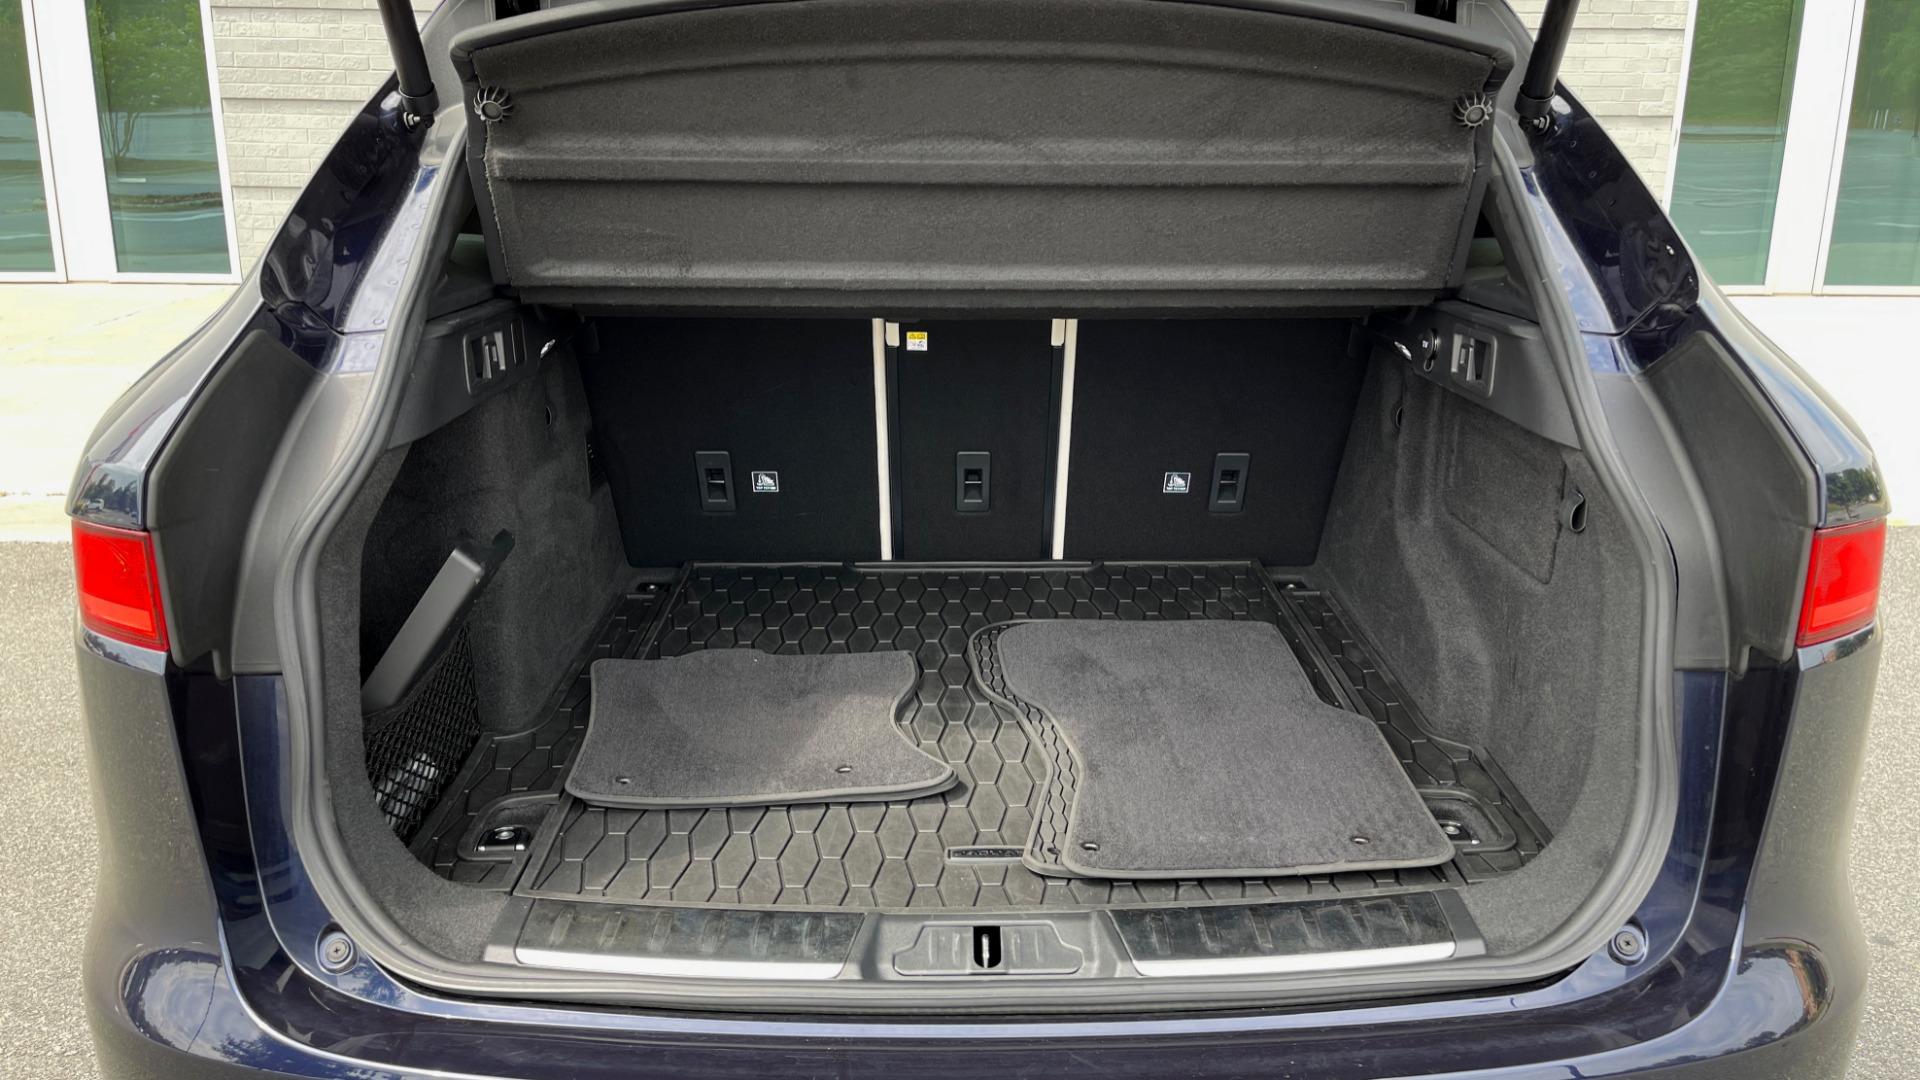 Used 2019 Jaguar F-PACE S / DRIVE PKG / BSA / HUD / BLACK EXT PKG / REARVIEW for sale $50,995 at Formula Imports in Charlotte NC 28227 16